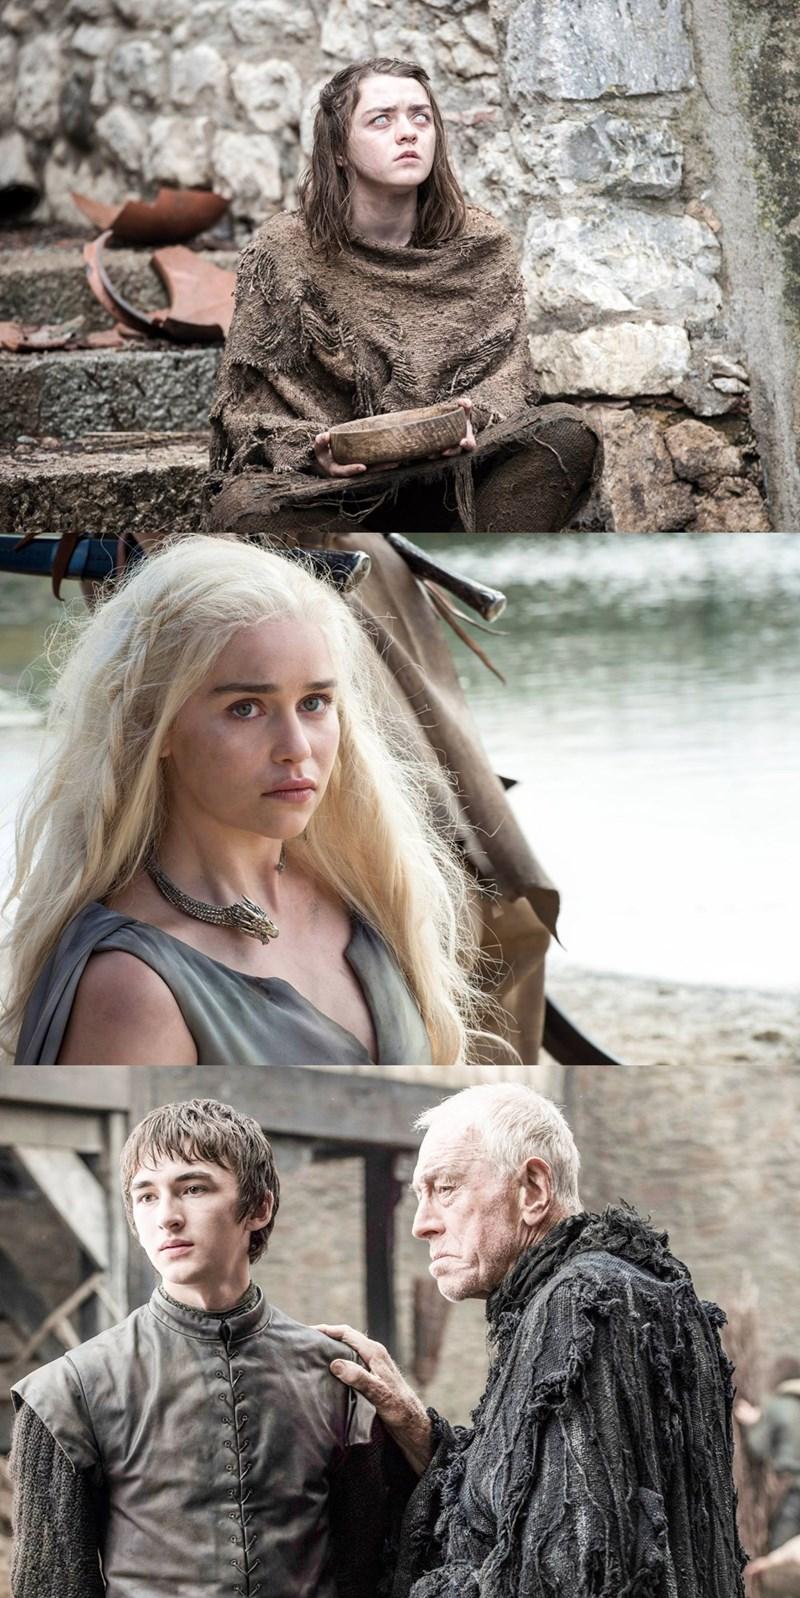 game of thrones season 6 photos sansa may be pregnant